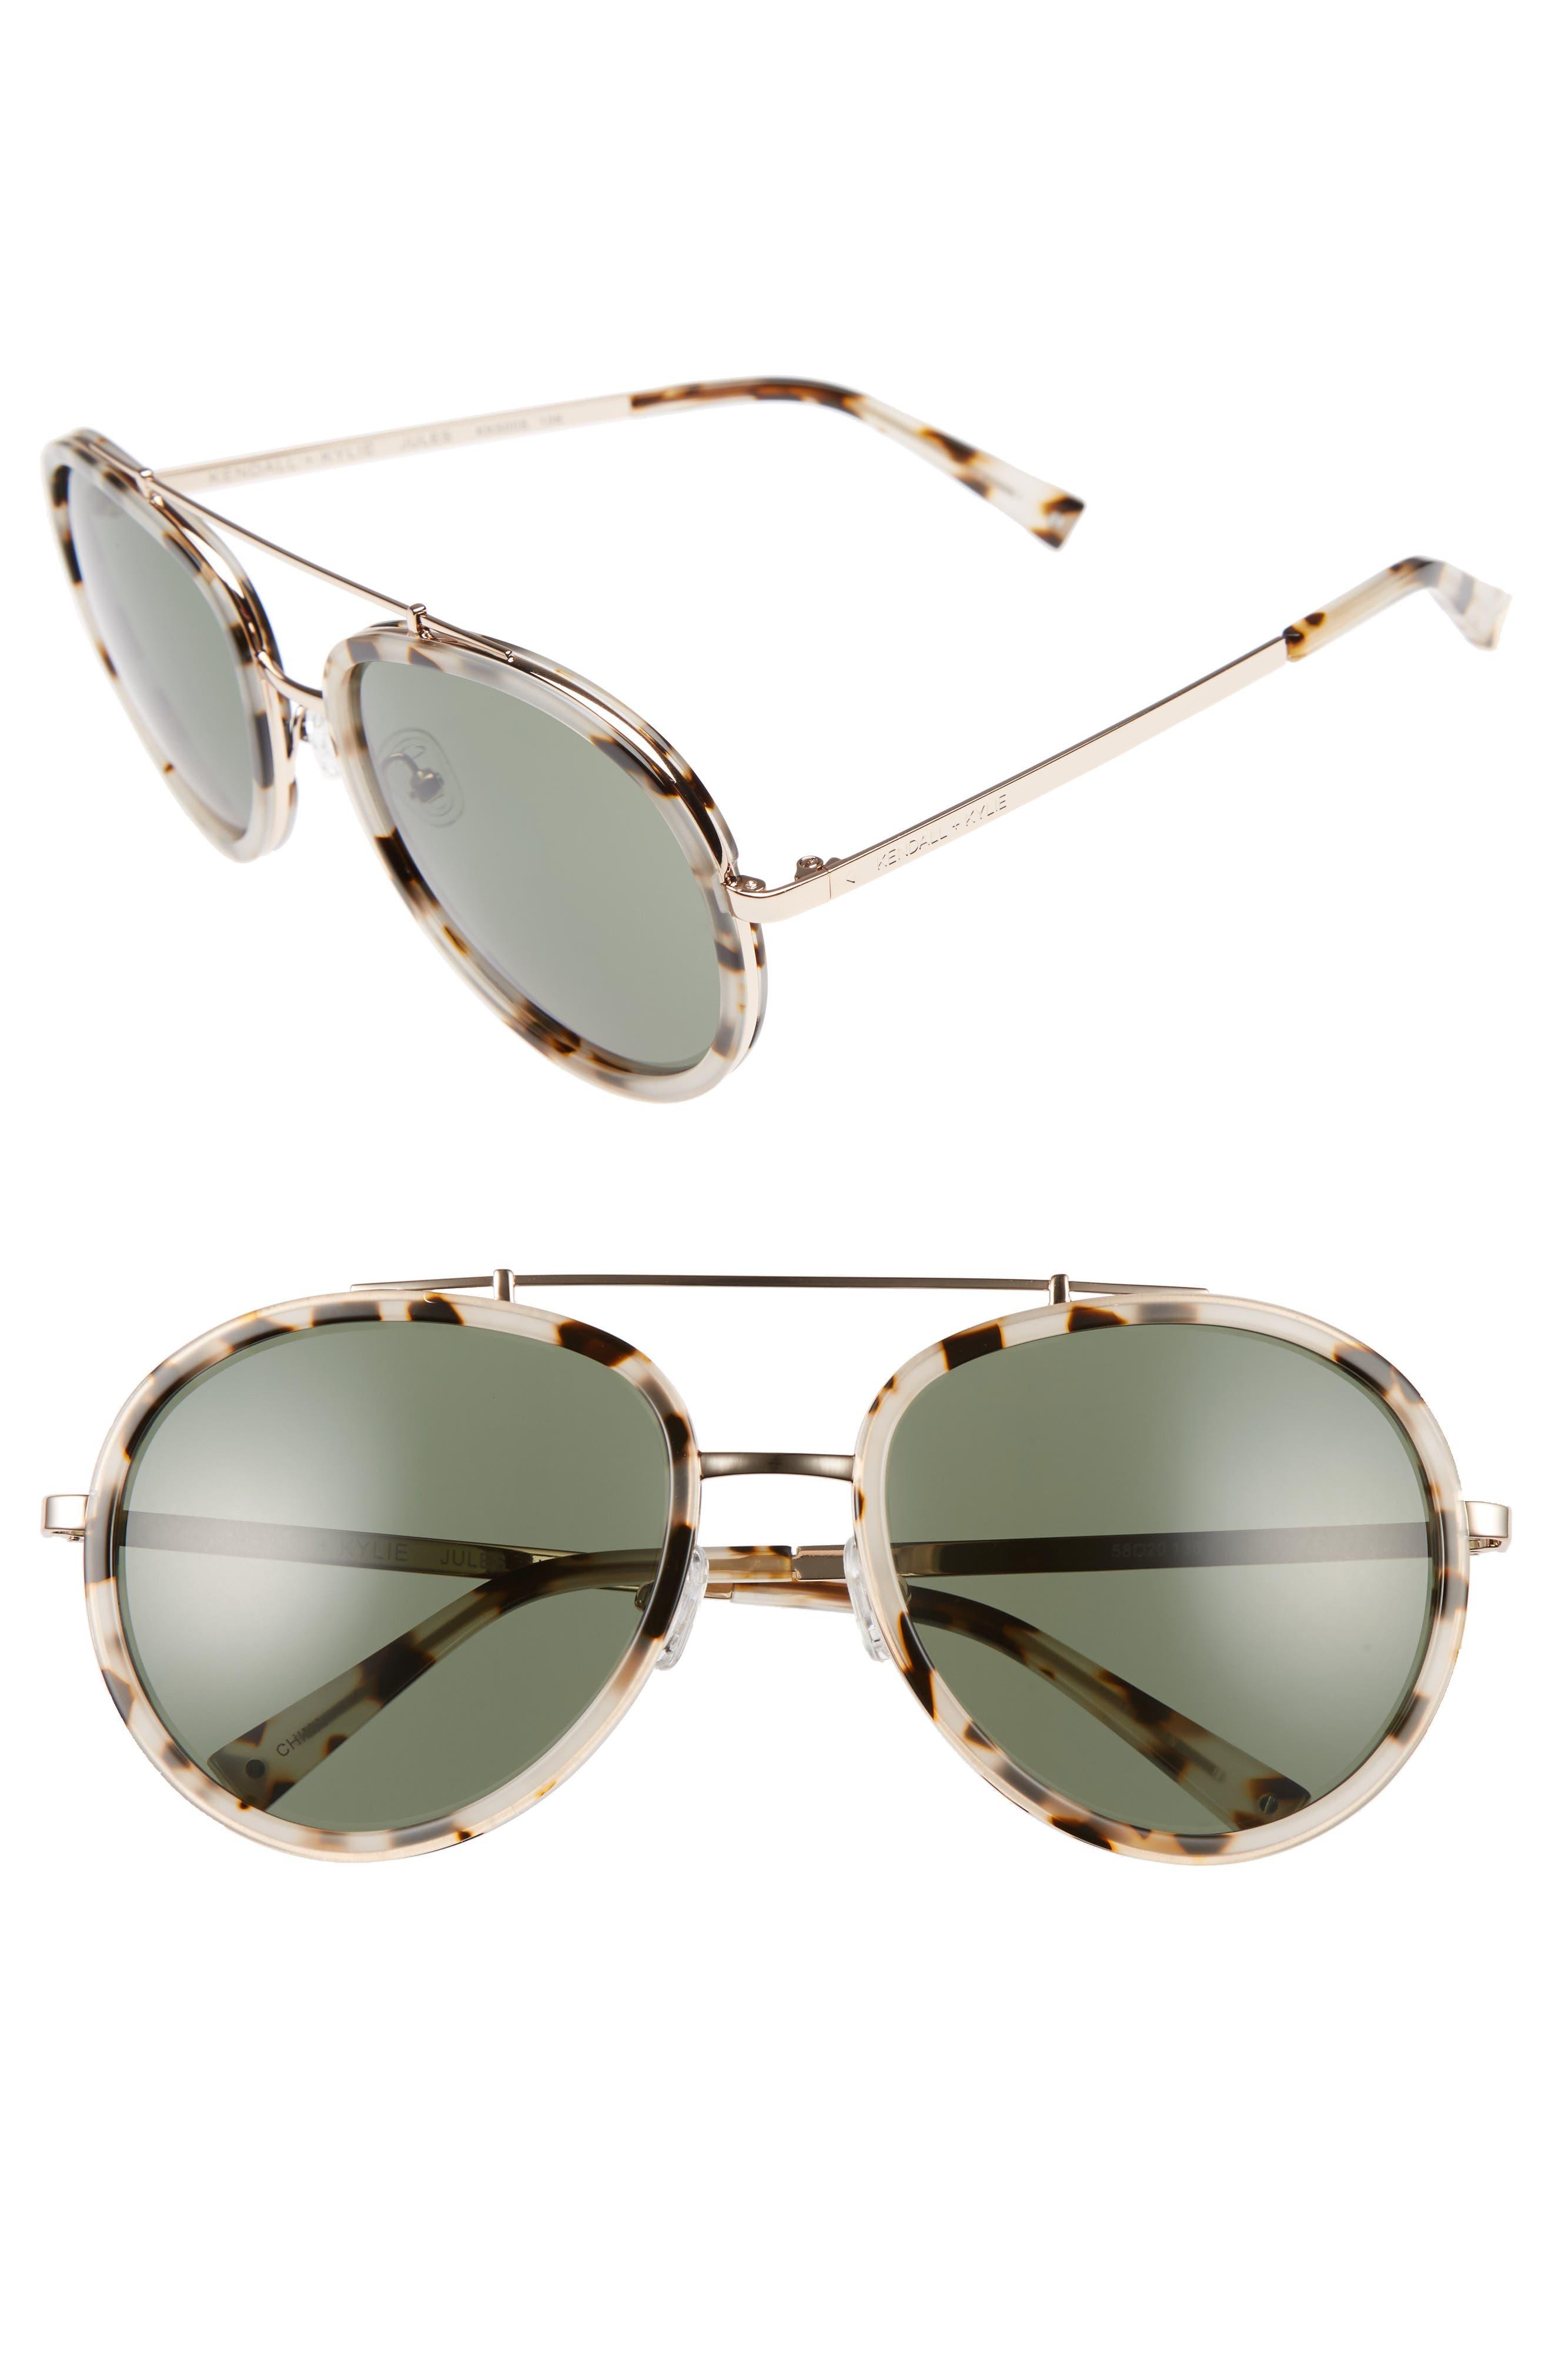 Alternate Image 1 Selected - KENDALL + KYLIE Jules 58mm Aviator Sunglasses